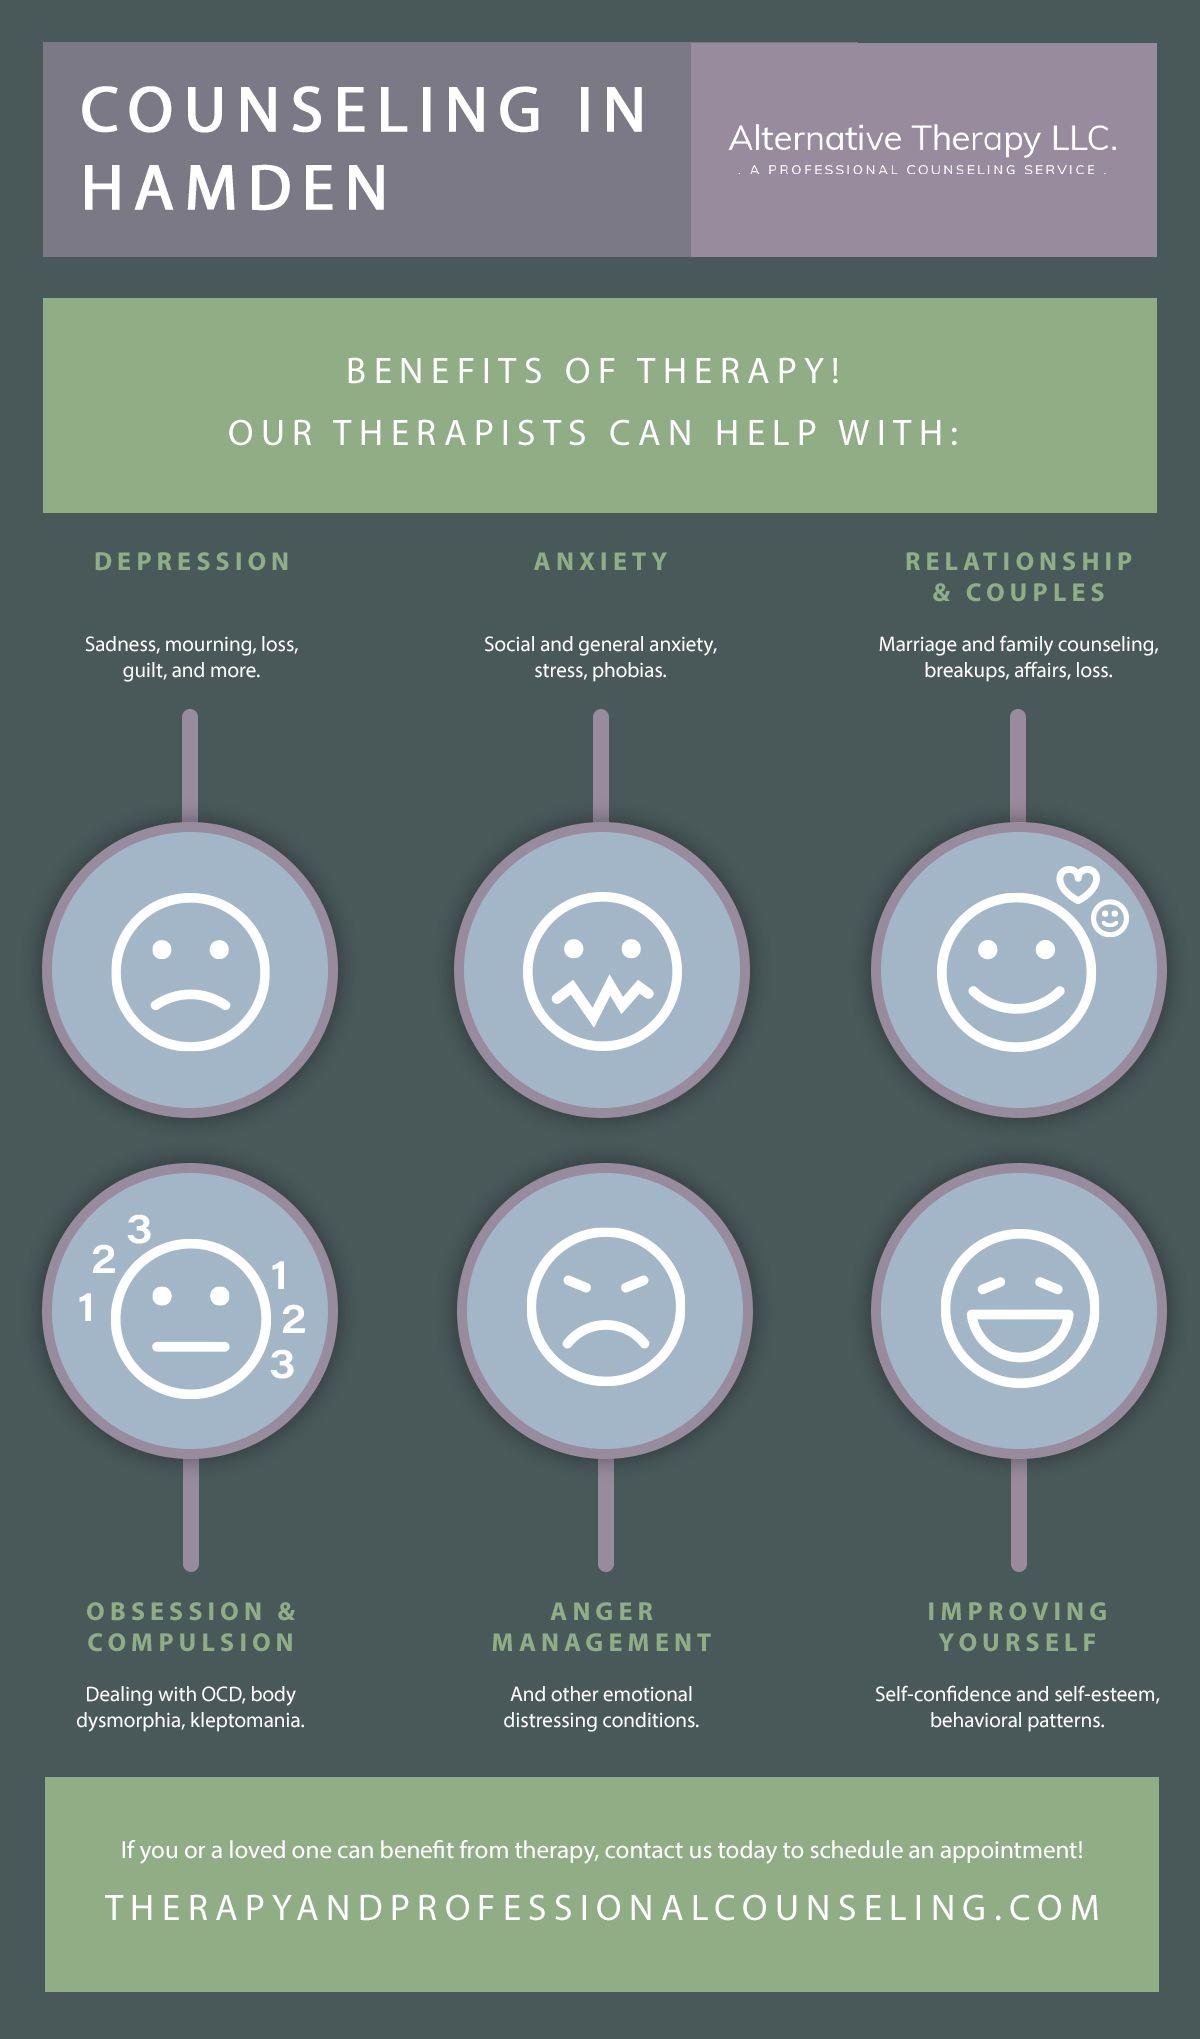 Counseling in Hamden Infographic.jpg